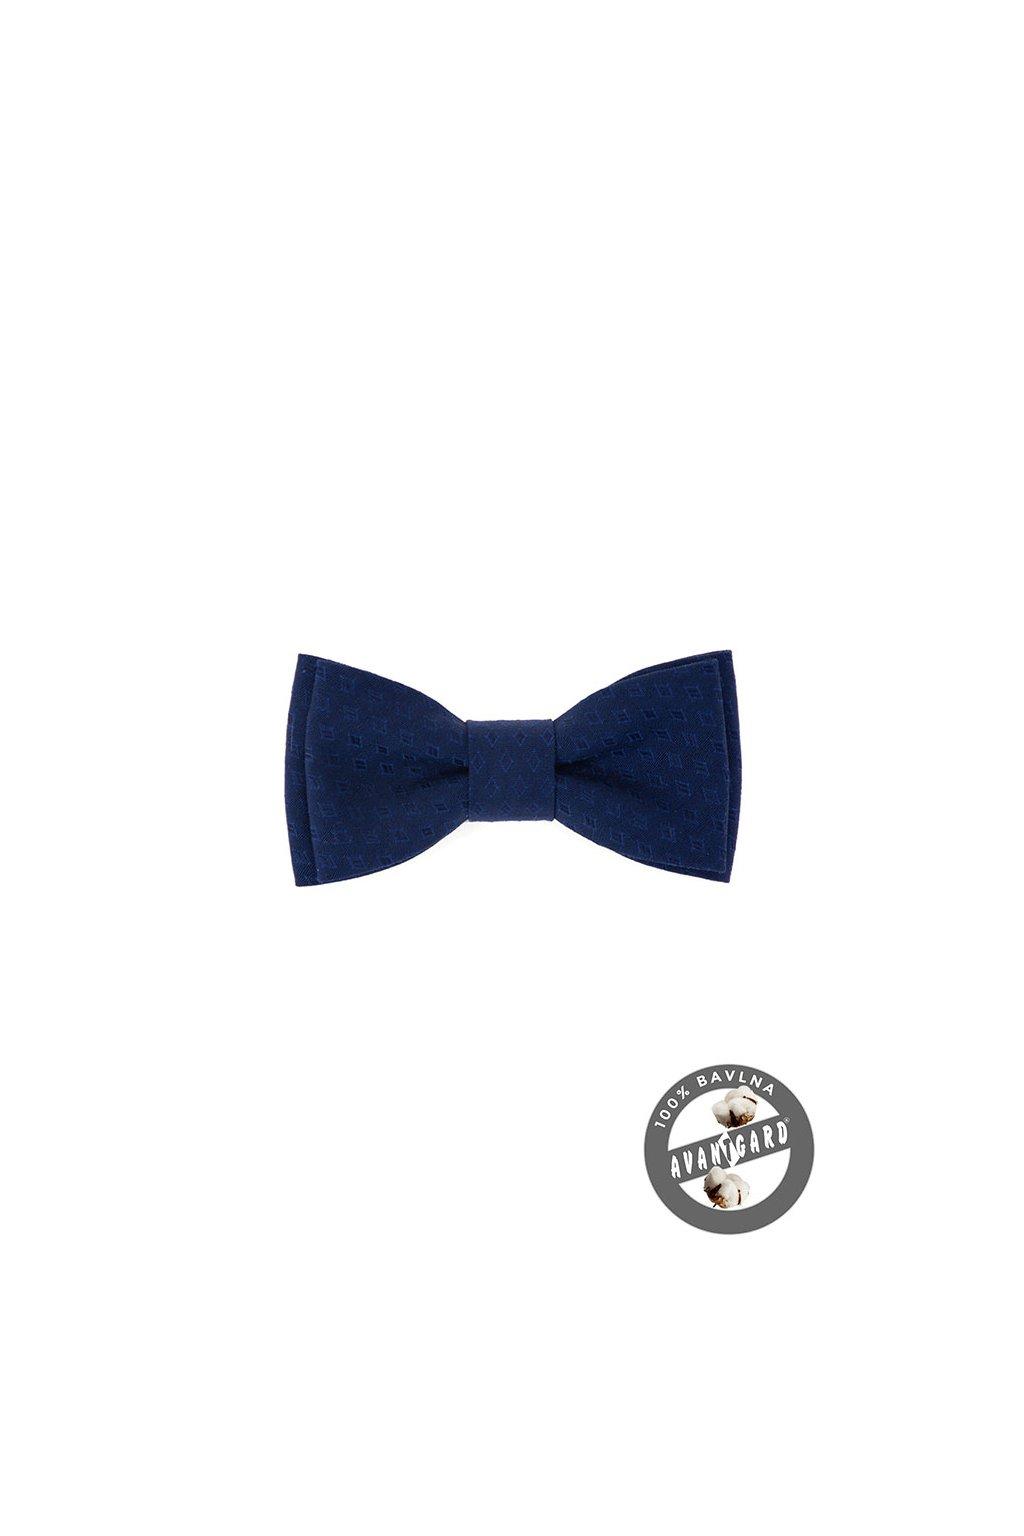 Motýlek MINI bavlněný, 531-51011, Modrá